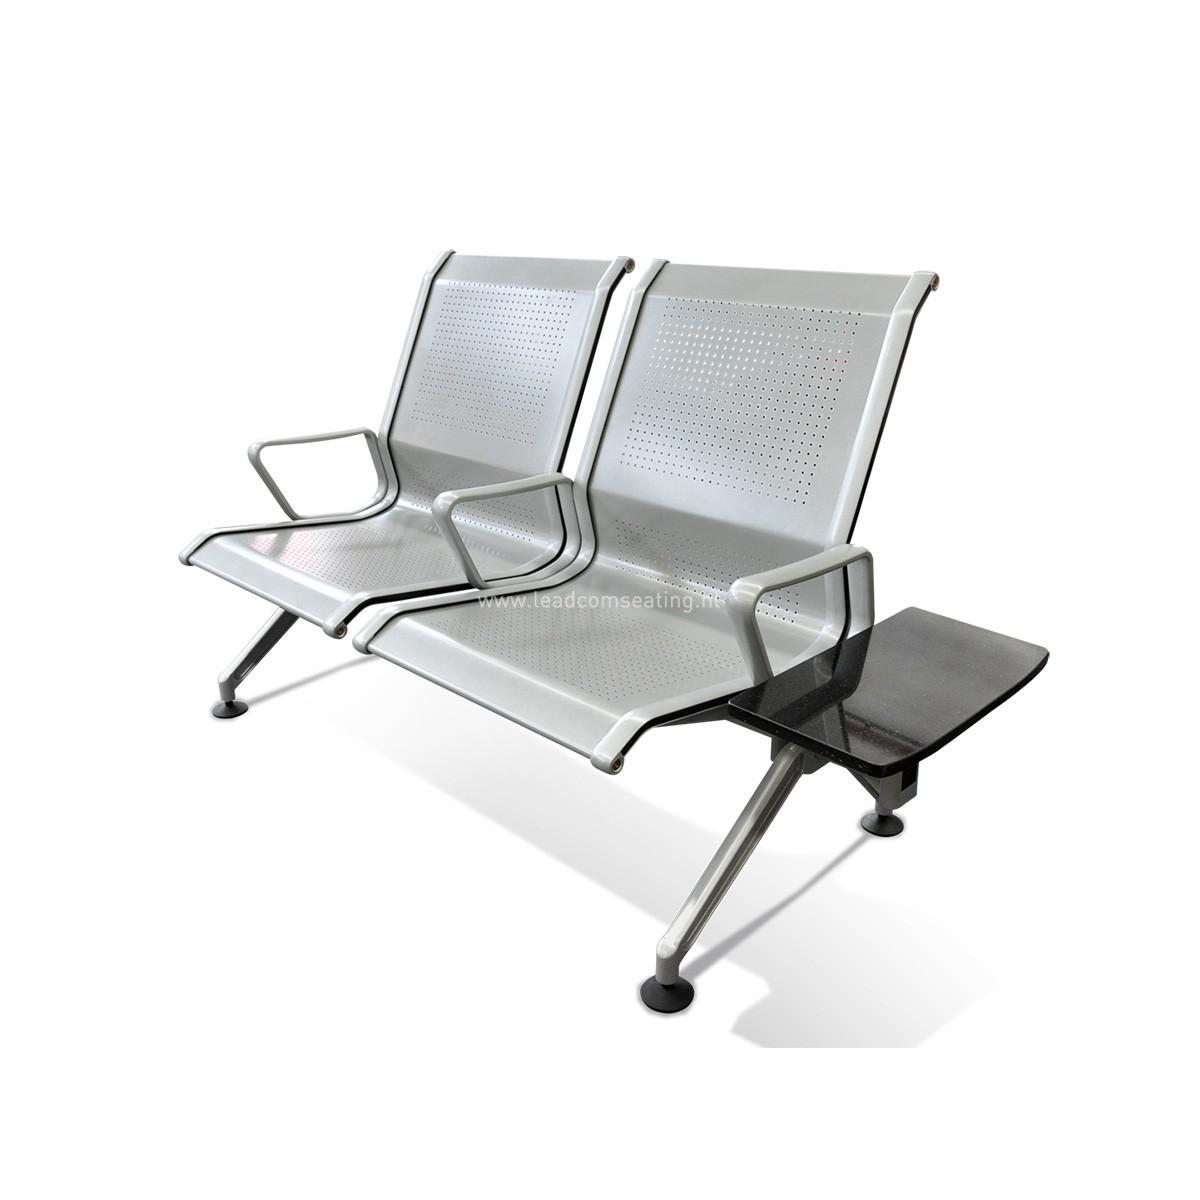 leadcom-waiting-area-seating-ls-528c_1